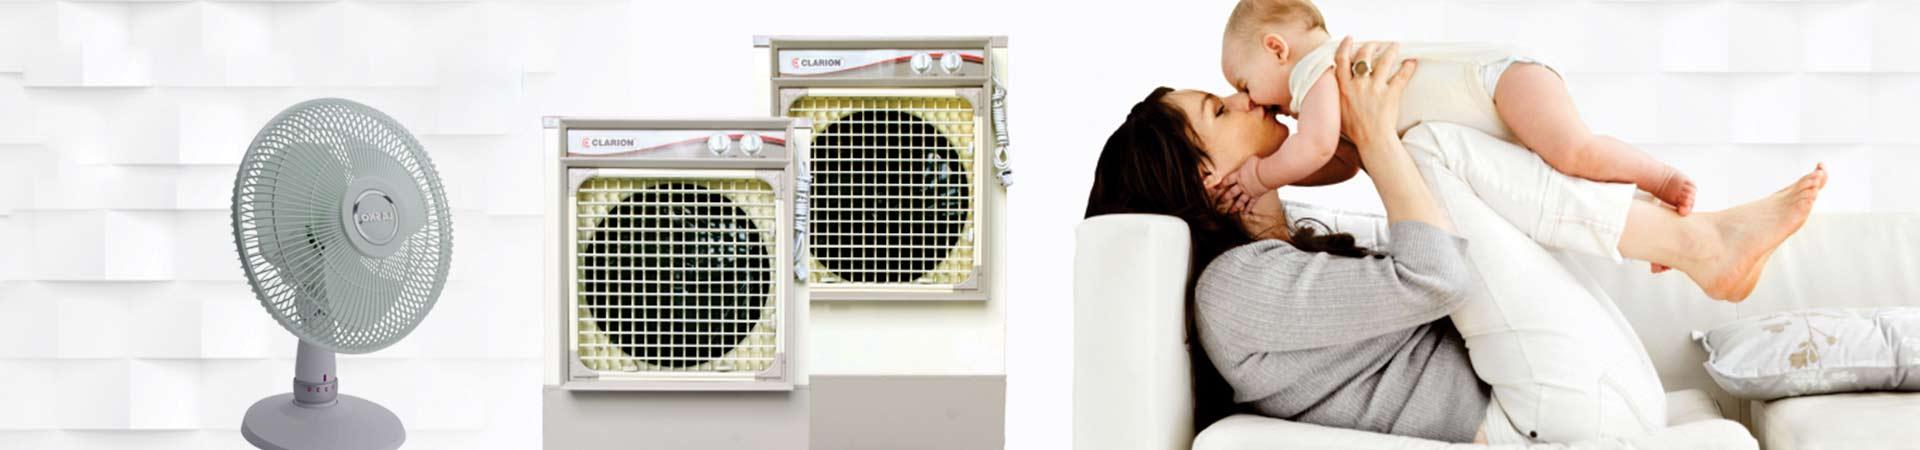 Fan Cooler Repair Service